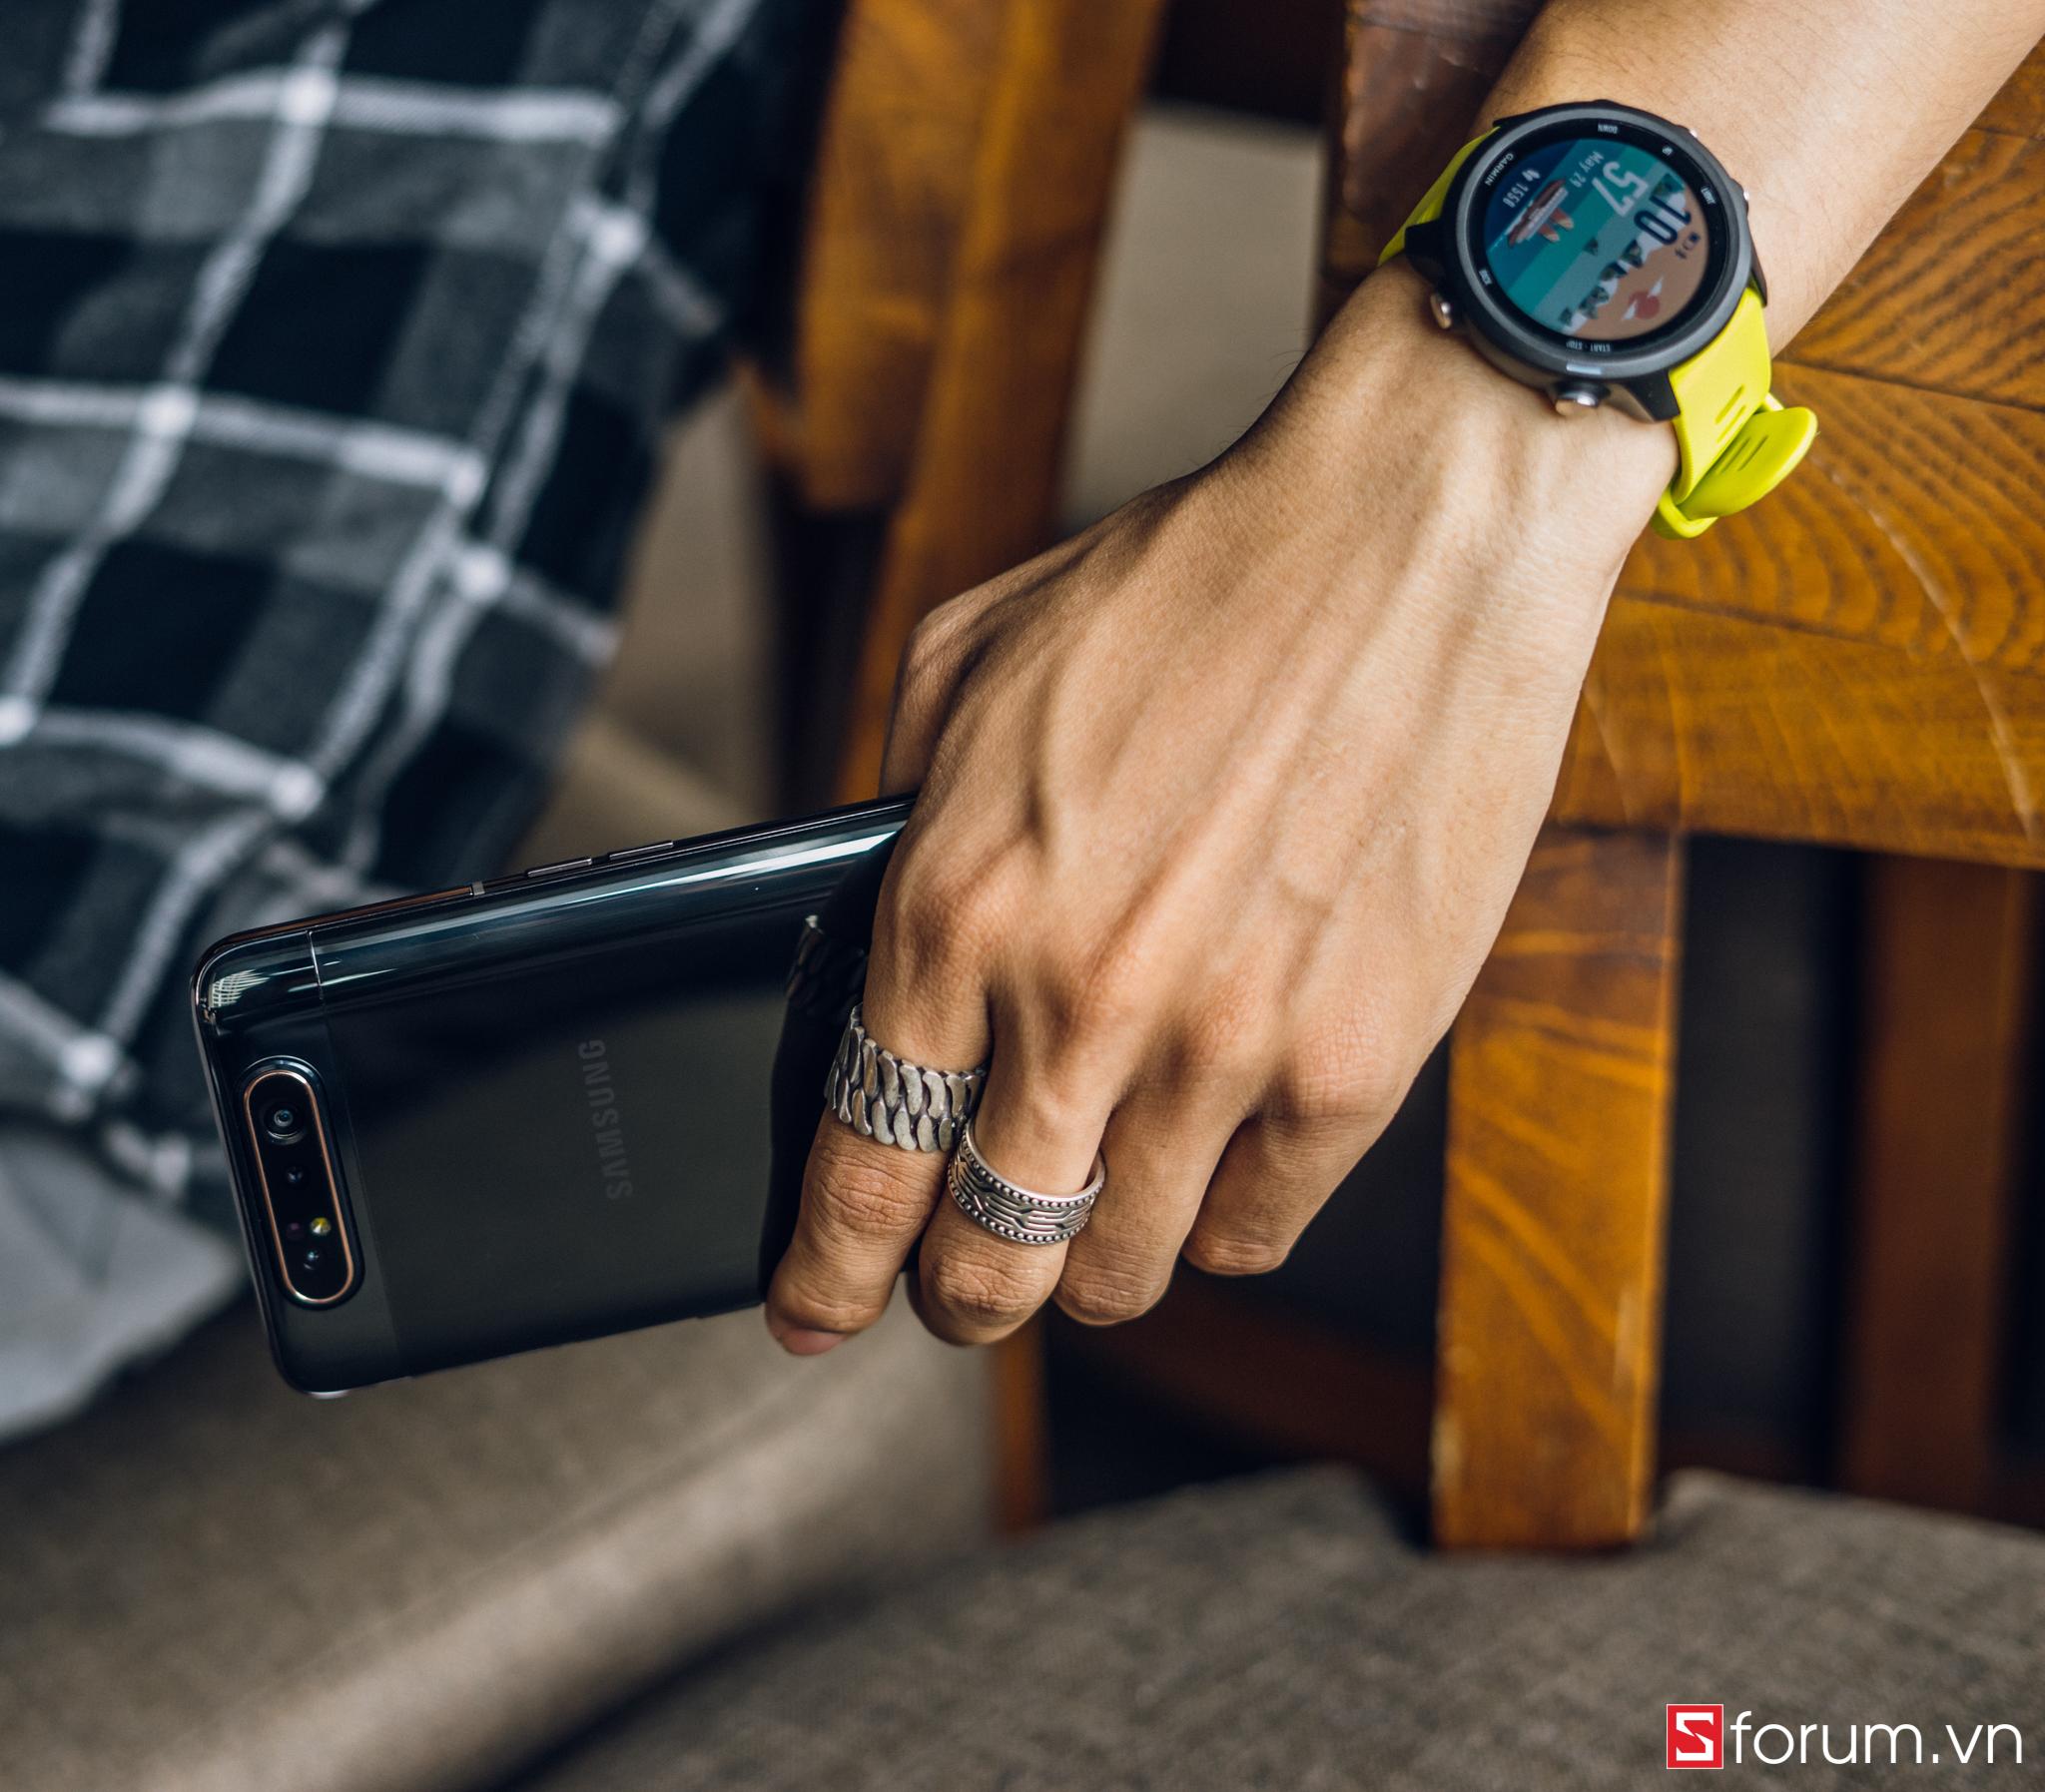 Sforum - Latest technology information page CPS-Garmin-Forerunner-245-40 Reviews Garmin Forerunner 245: Smartwatch